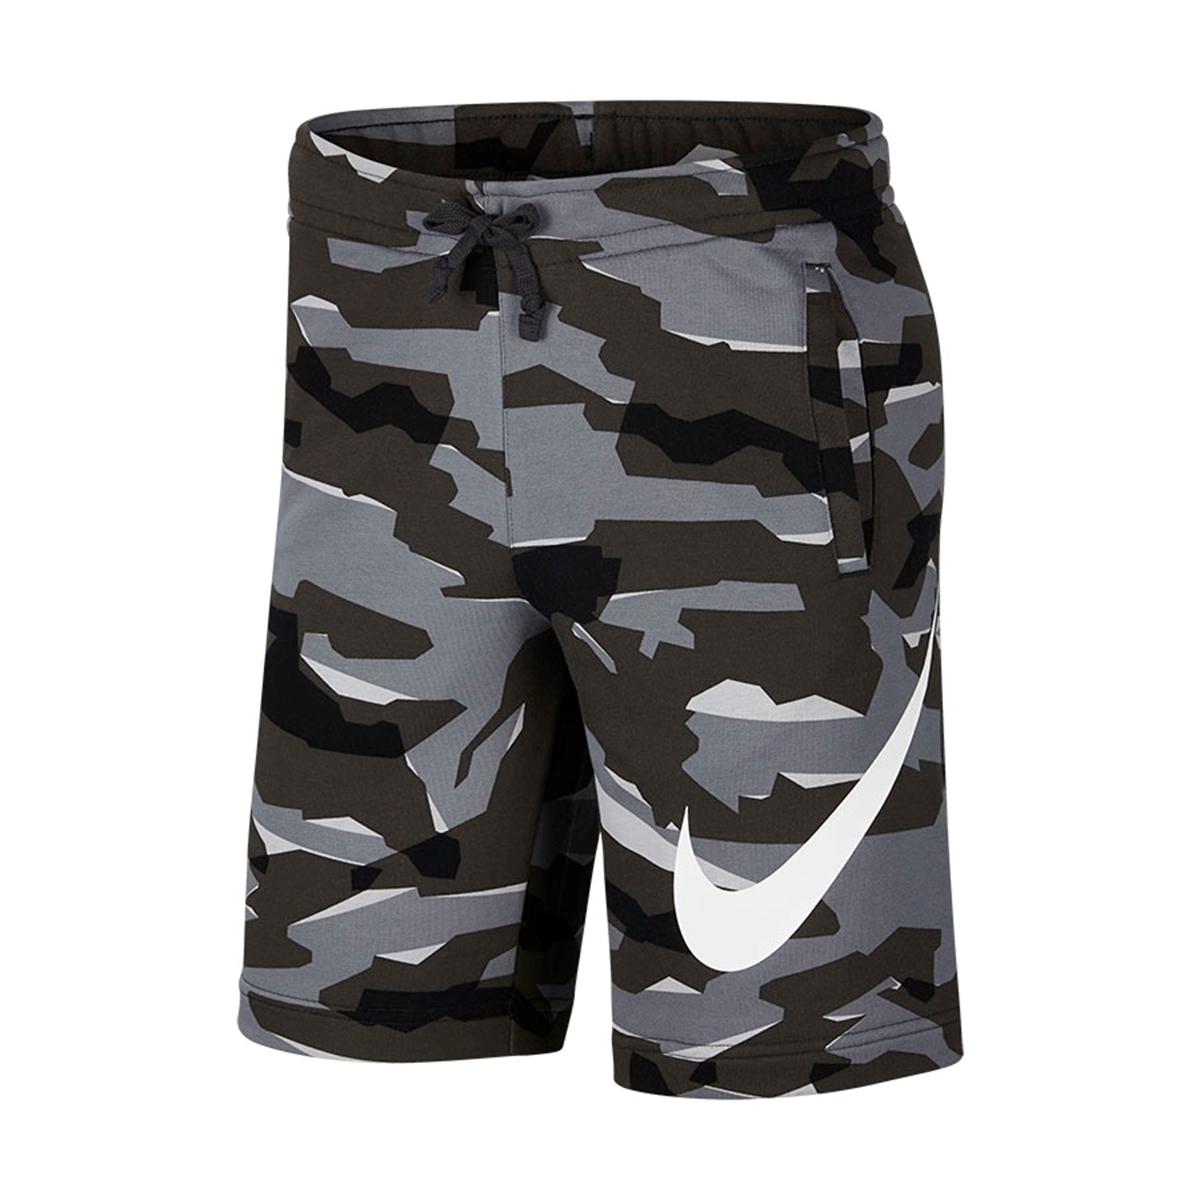 0adbfdb8 Nike M NSW CLUB CAMO SHORT FT AQ0602-065- Nava Sport - Vi selger ...